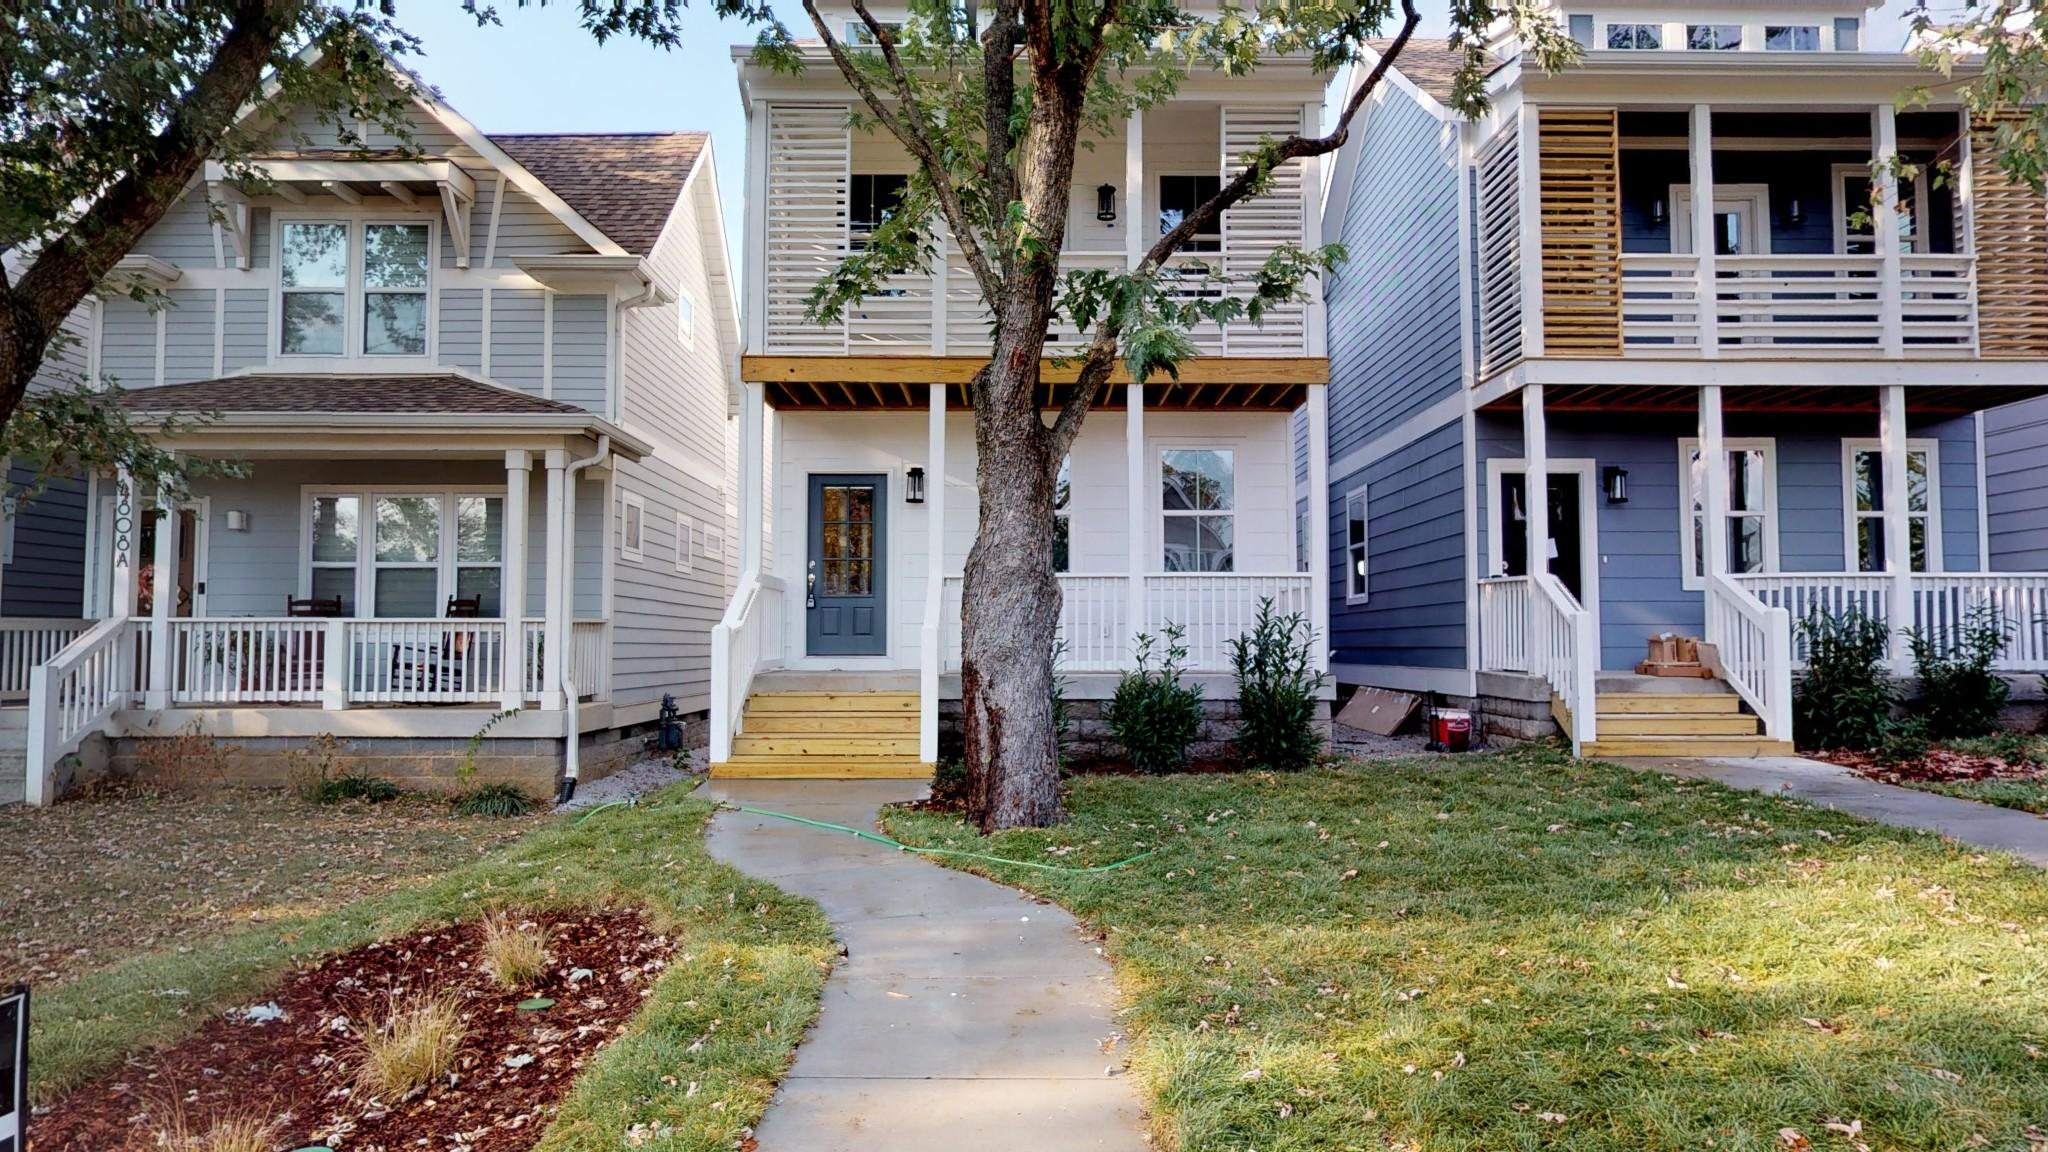 4908B Michigan Ave Property Photo - Nashville, TN real estate listing